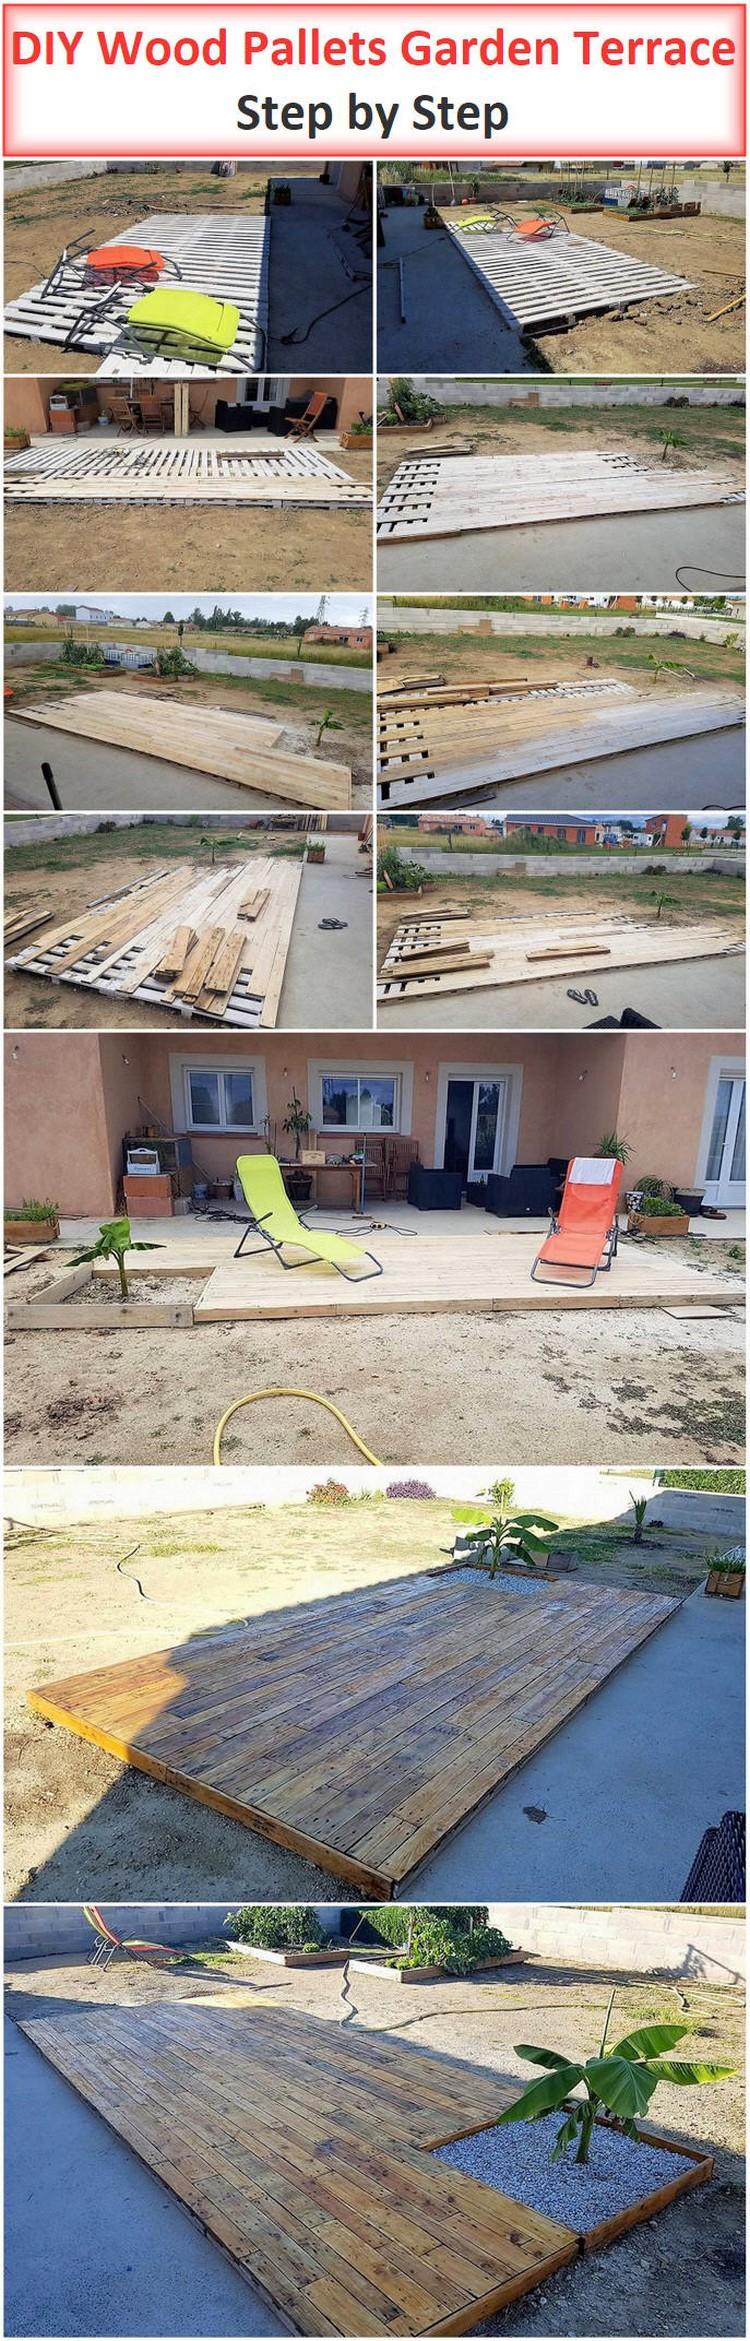 DIY Wood Pallets Garden Terrace Step by Step